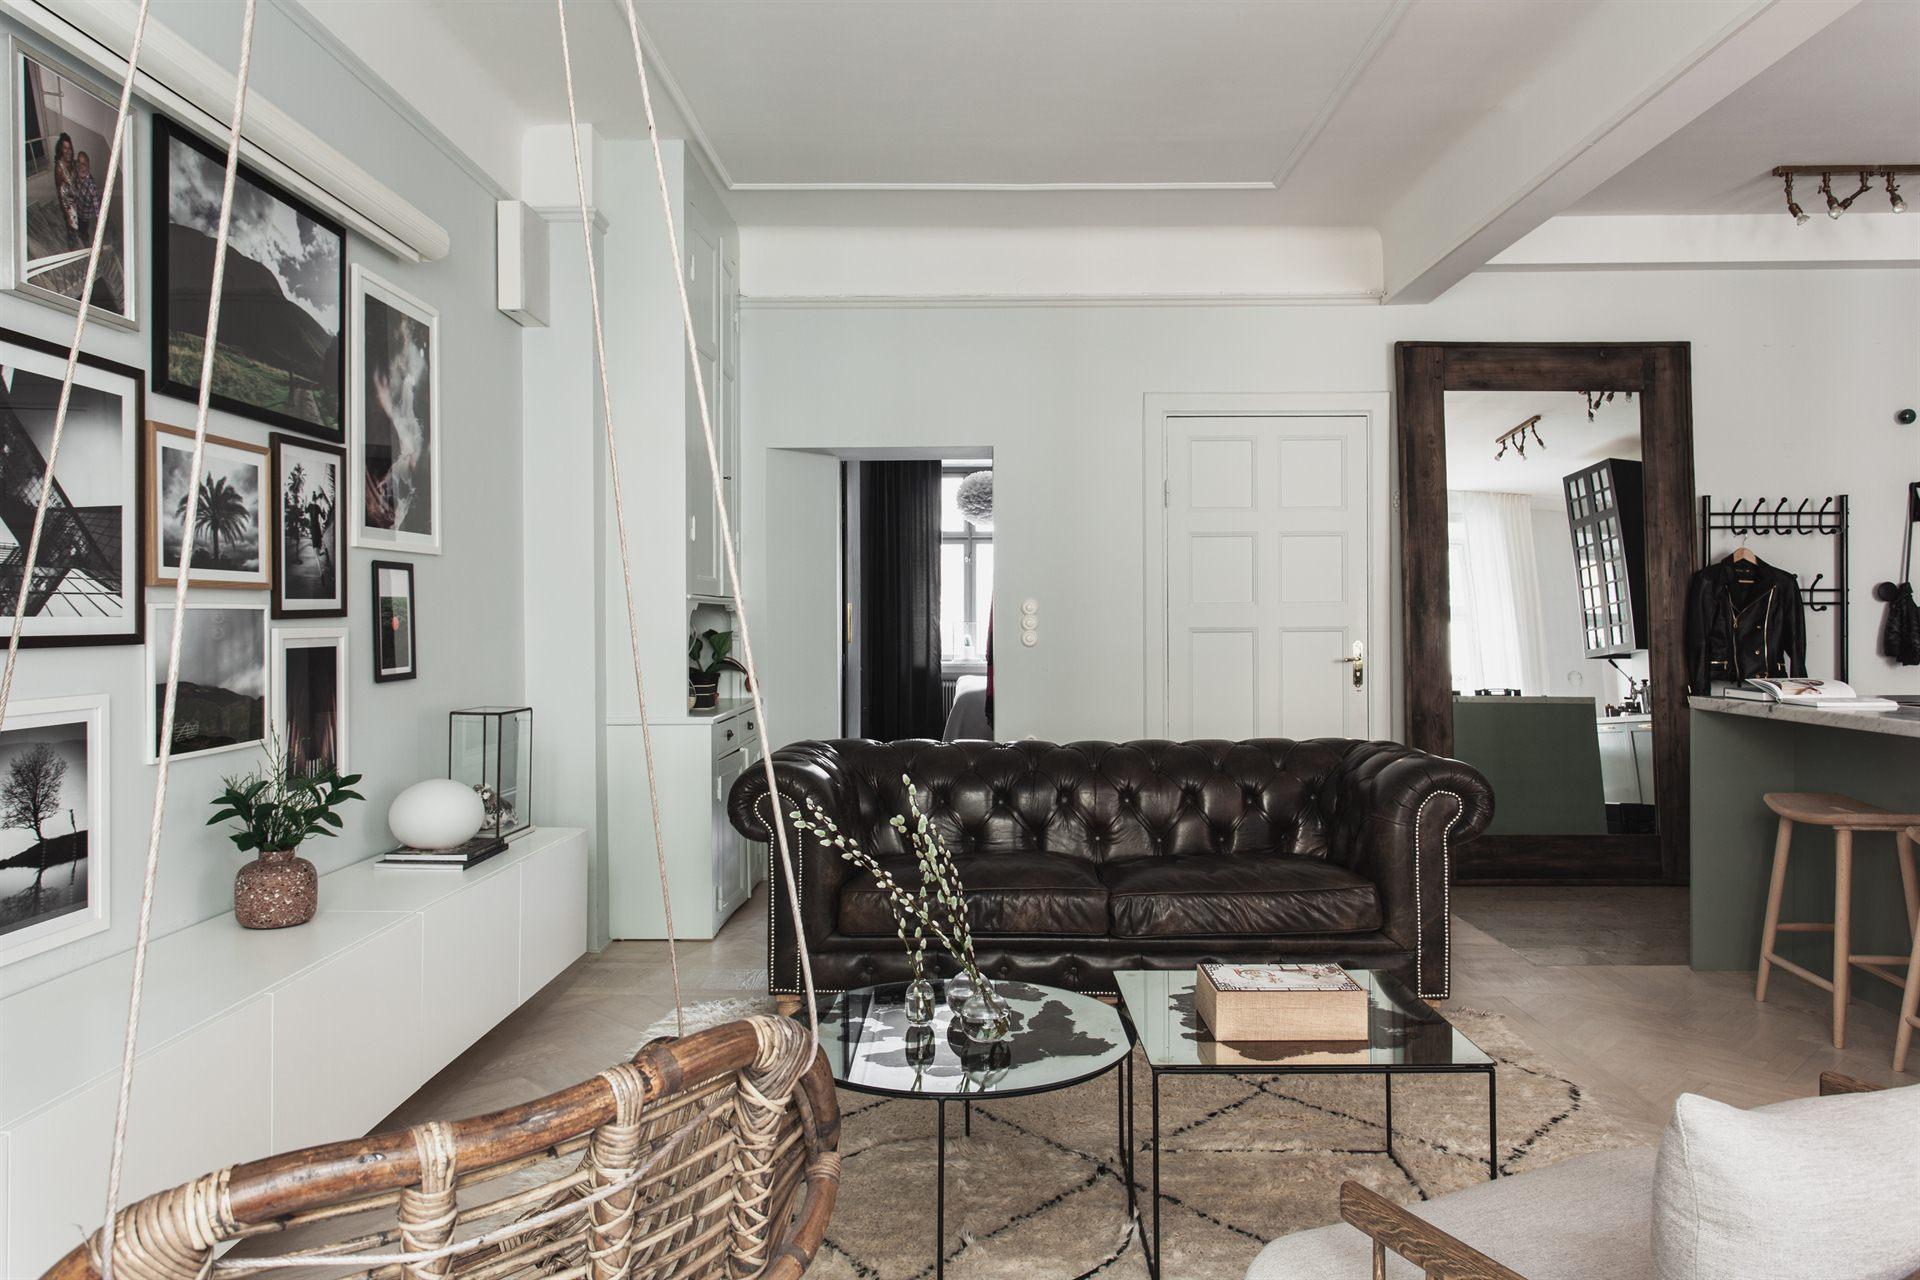 квартира 67 квм гостиная диван